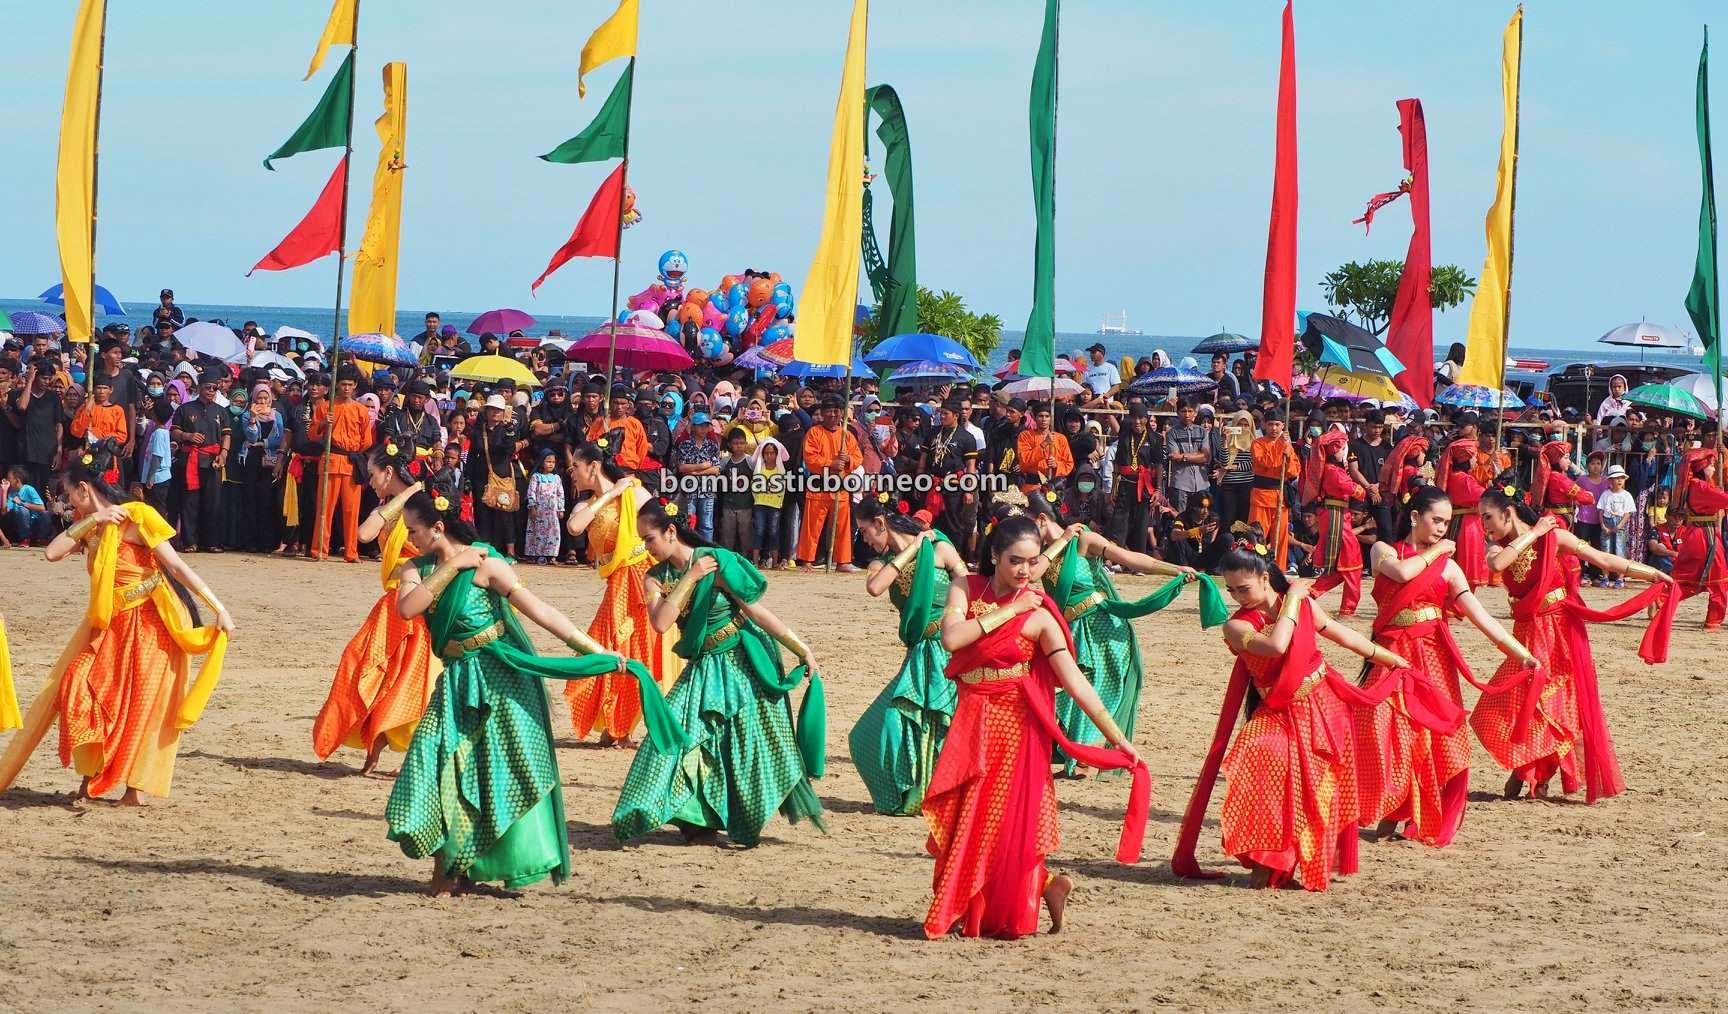 Festival Iraw Tengkayu, Suku Dayak Tidung, authentic, traditional, indigenous, culture, event, native, tribal, Indonesia, North Kalimantan, wisata budaya, Tourism, travel guide, Borneo,